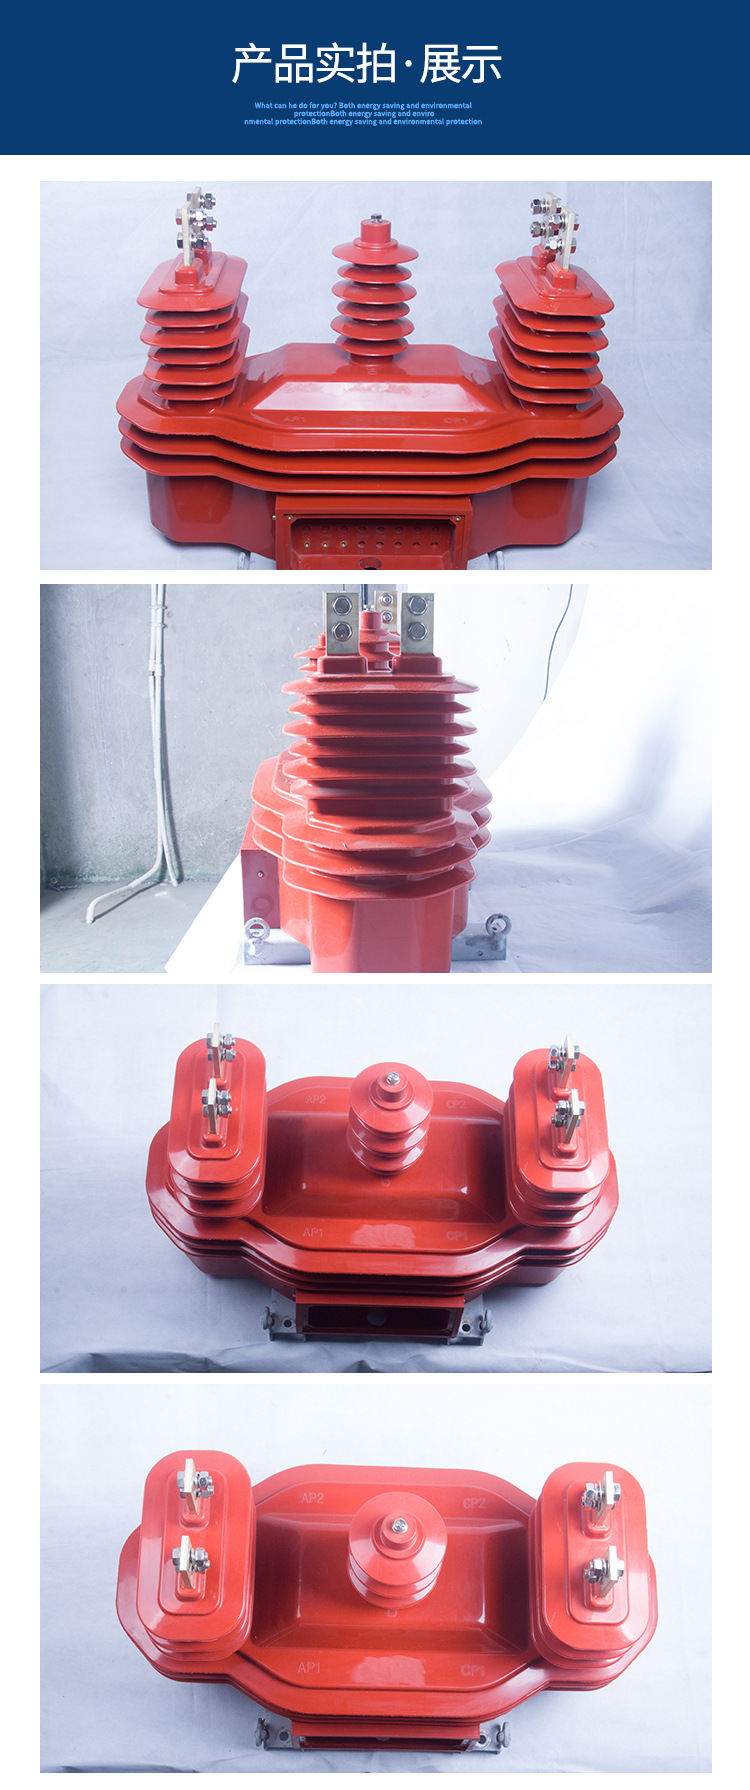 JLSZV-10KV户外高压电力计量箱示例图6